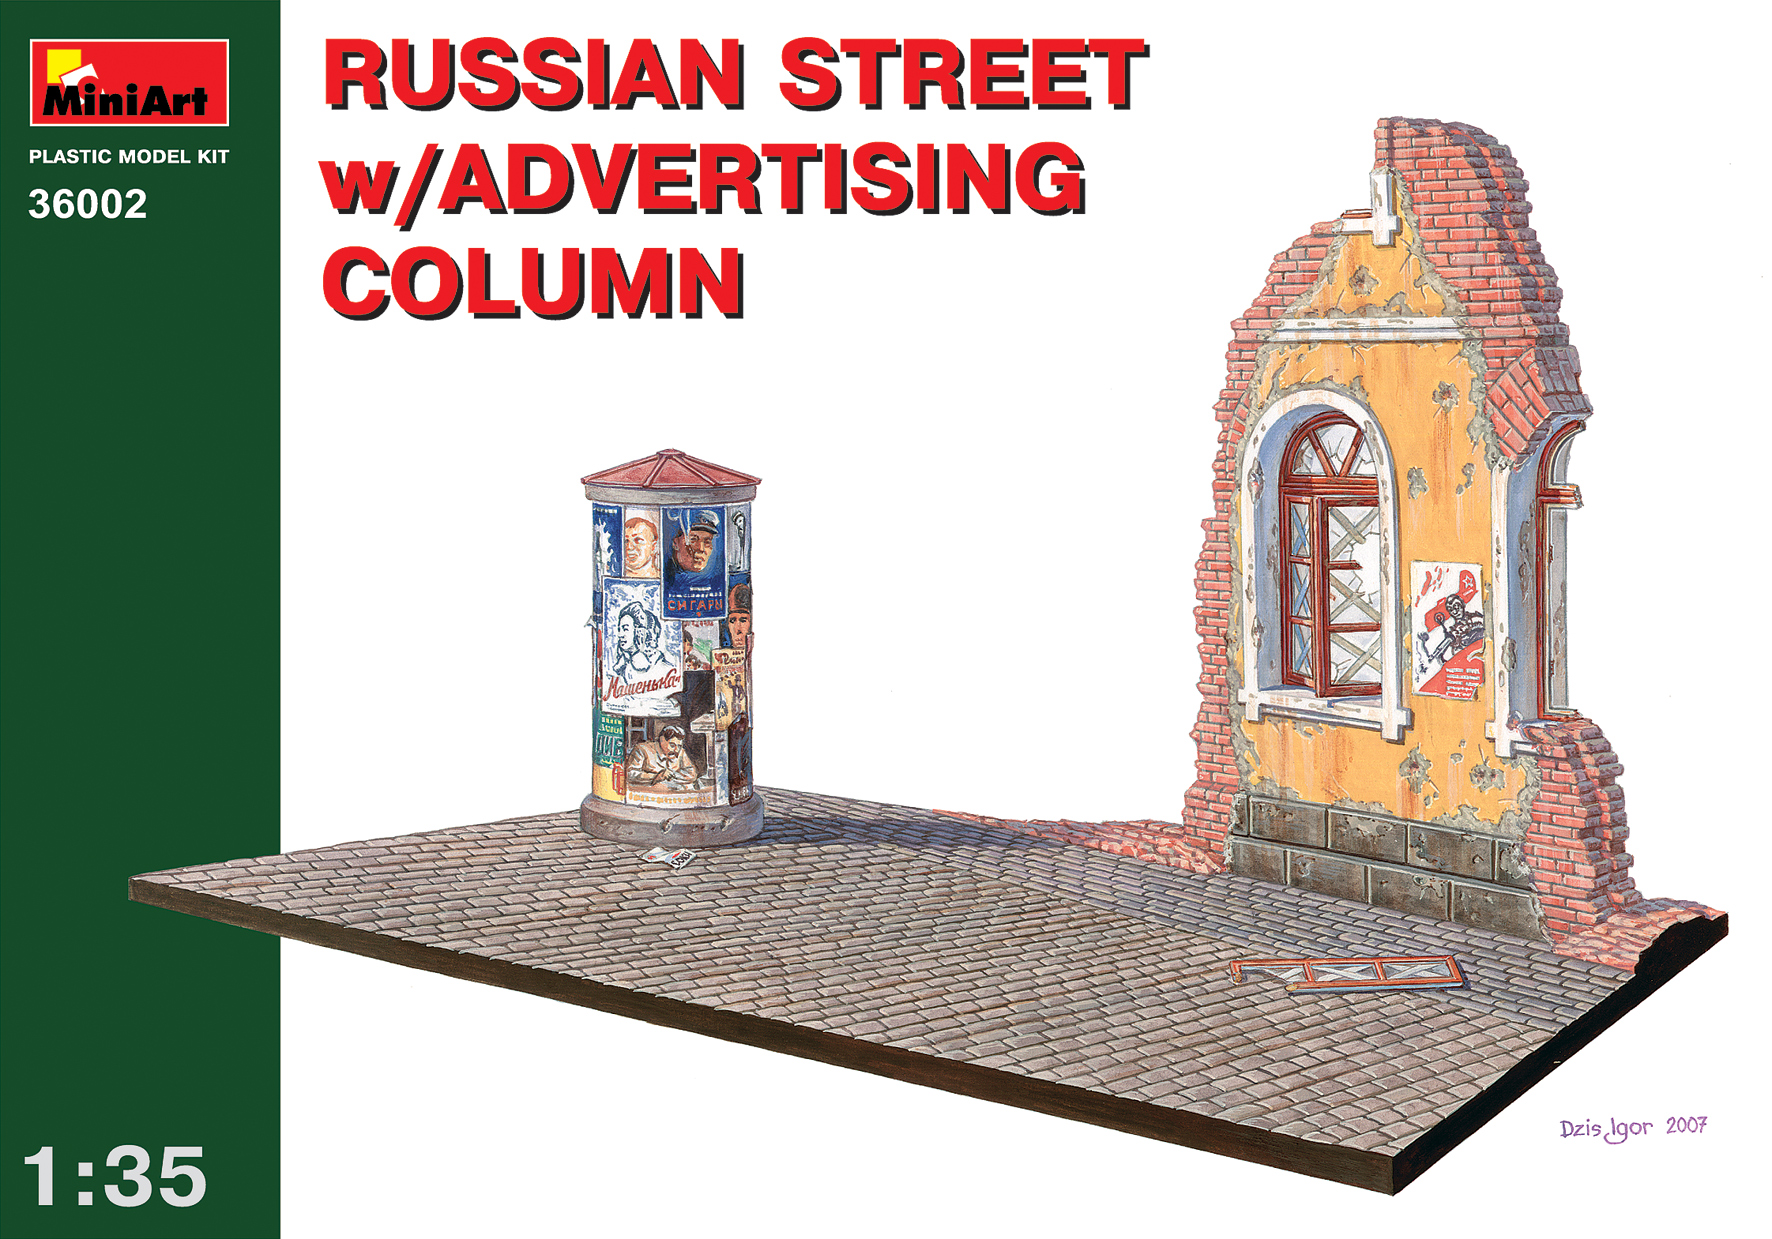 36002 RUSSIAN STREET w/ADVERTISING COLUMN